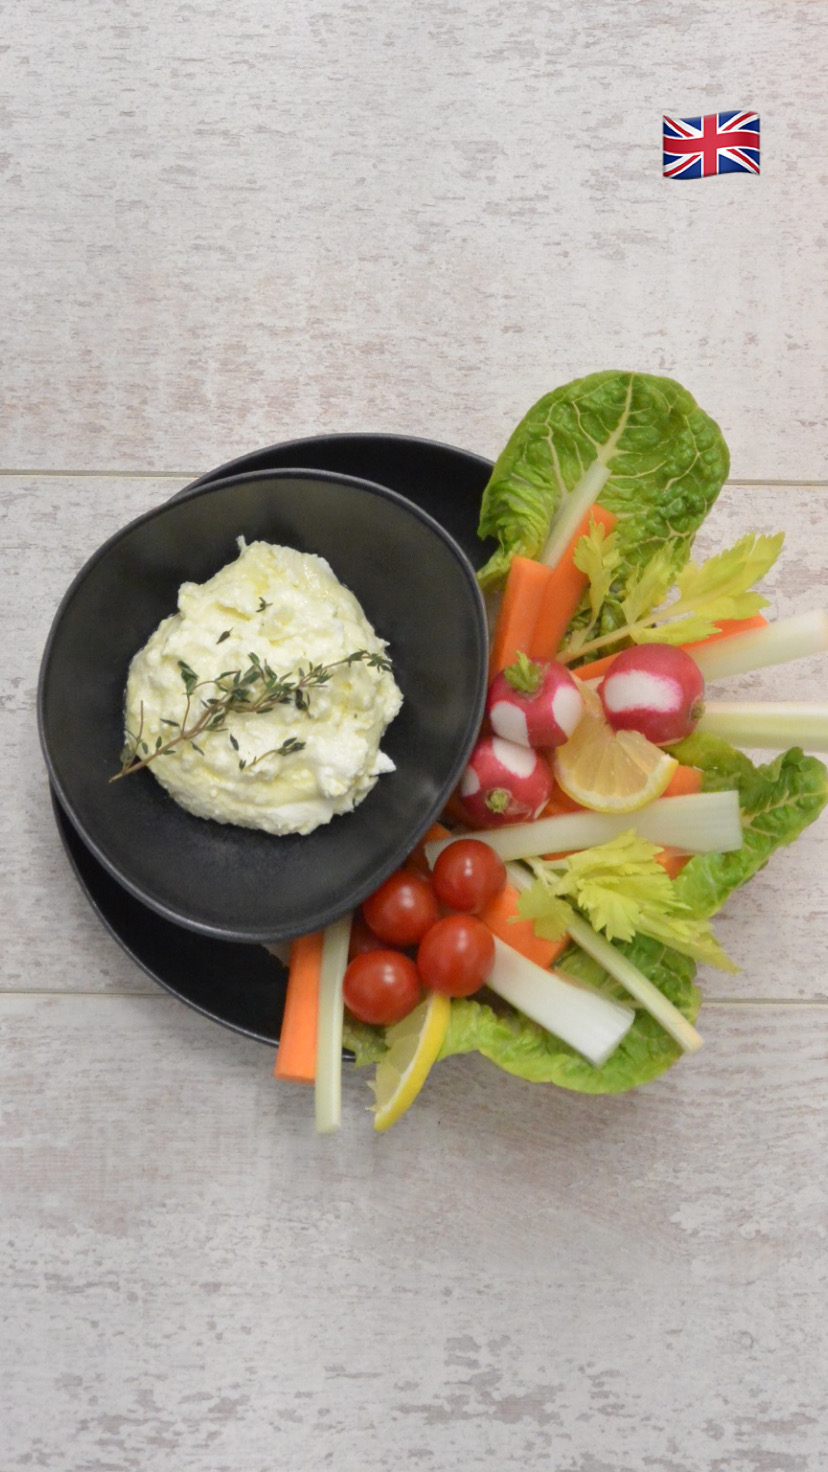 ORGANIC FETA CHEESE DIP With raw veggies